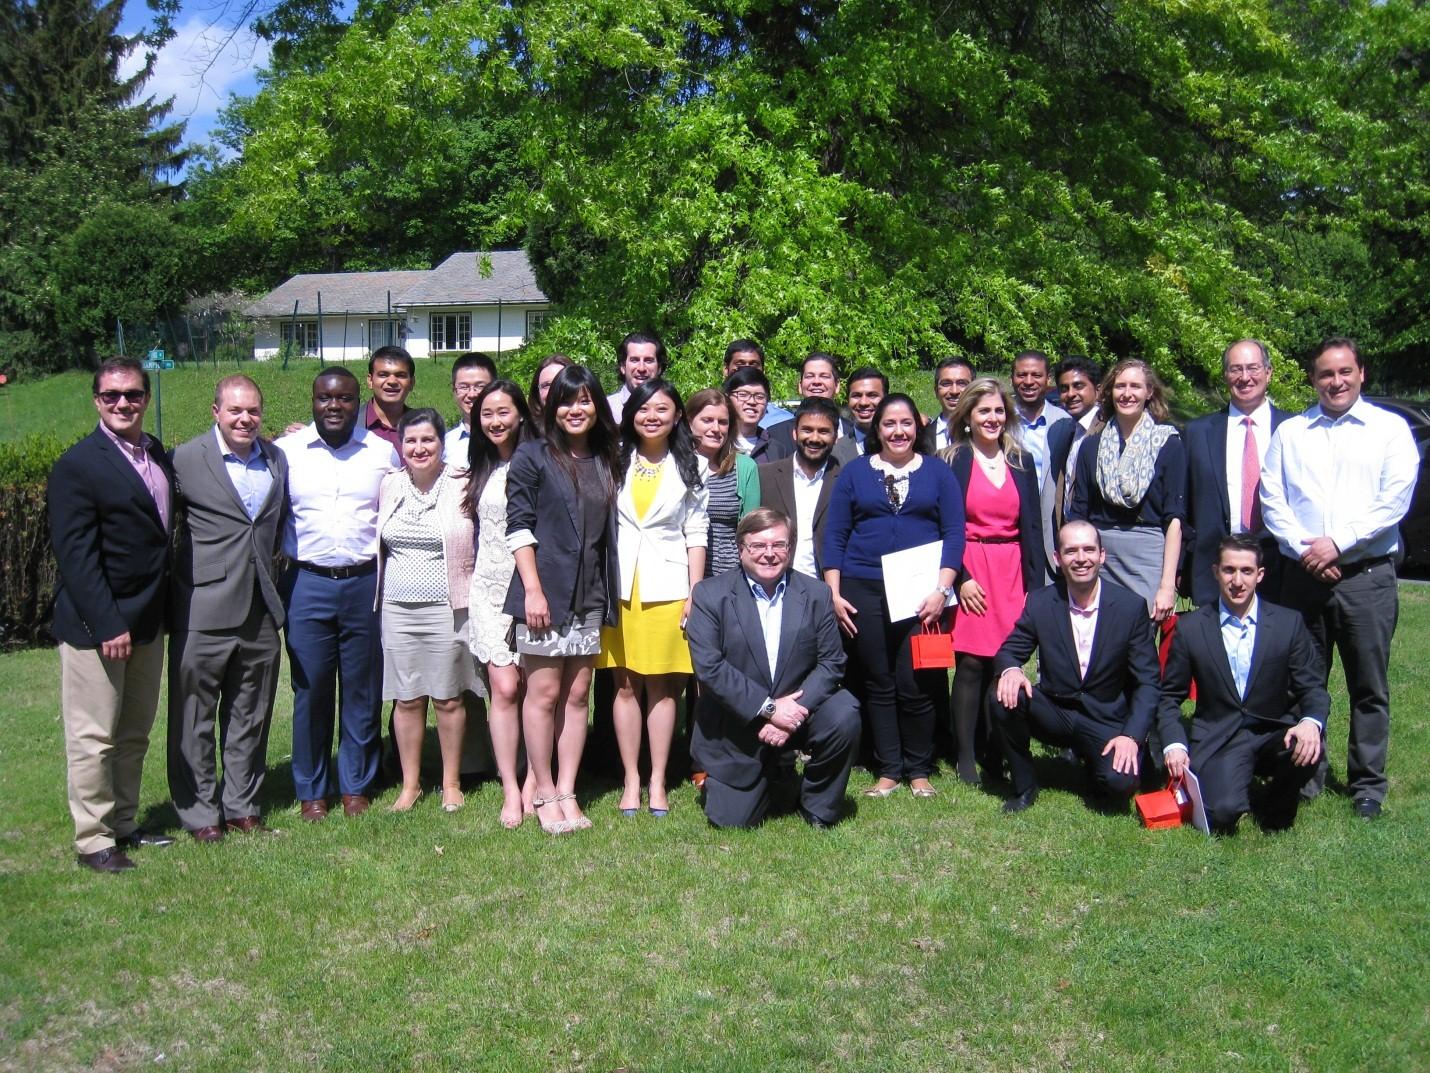 EMI graduates